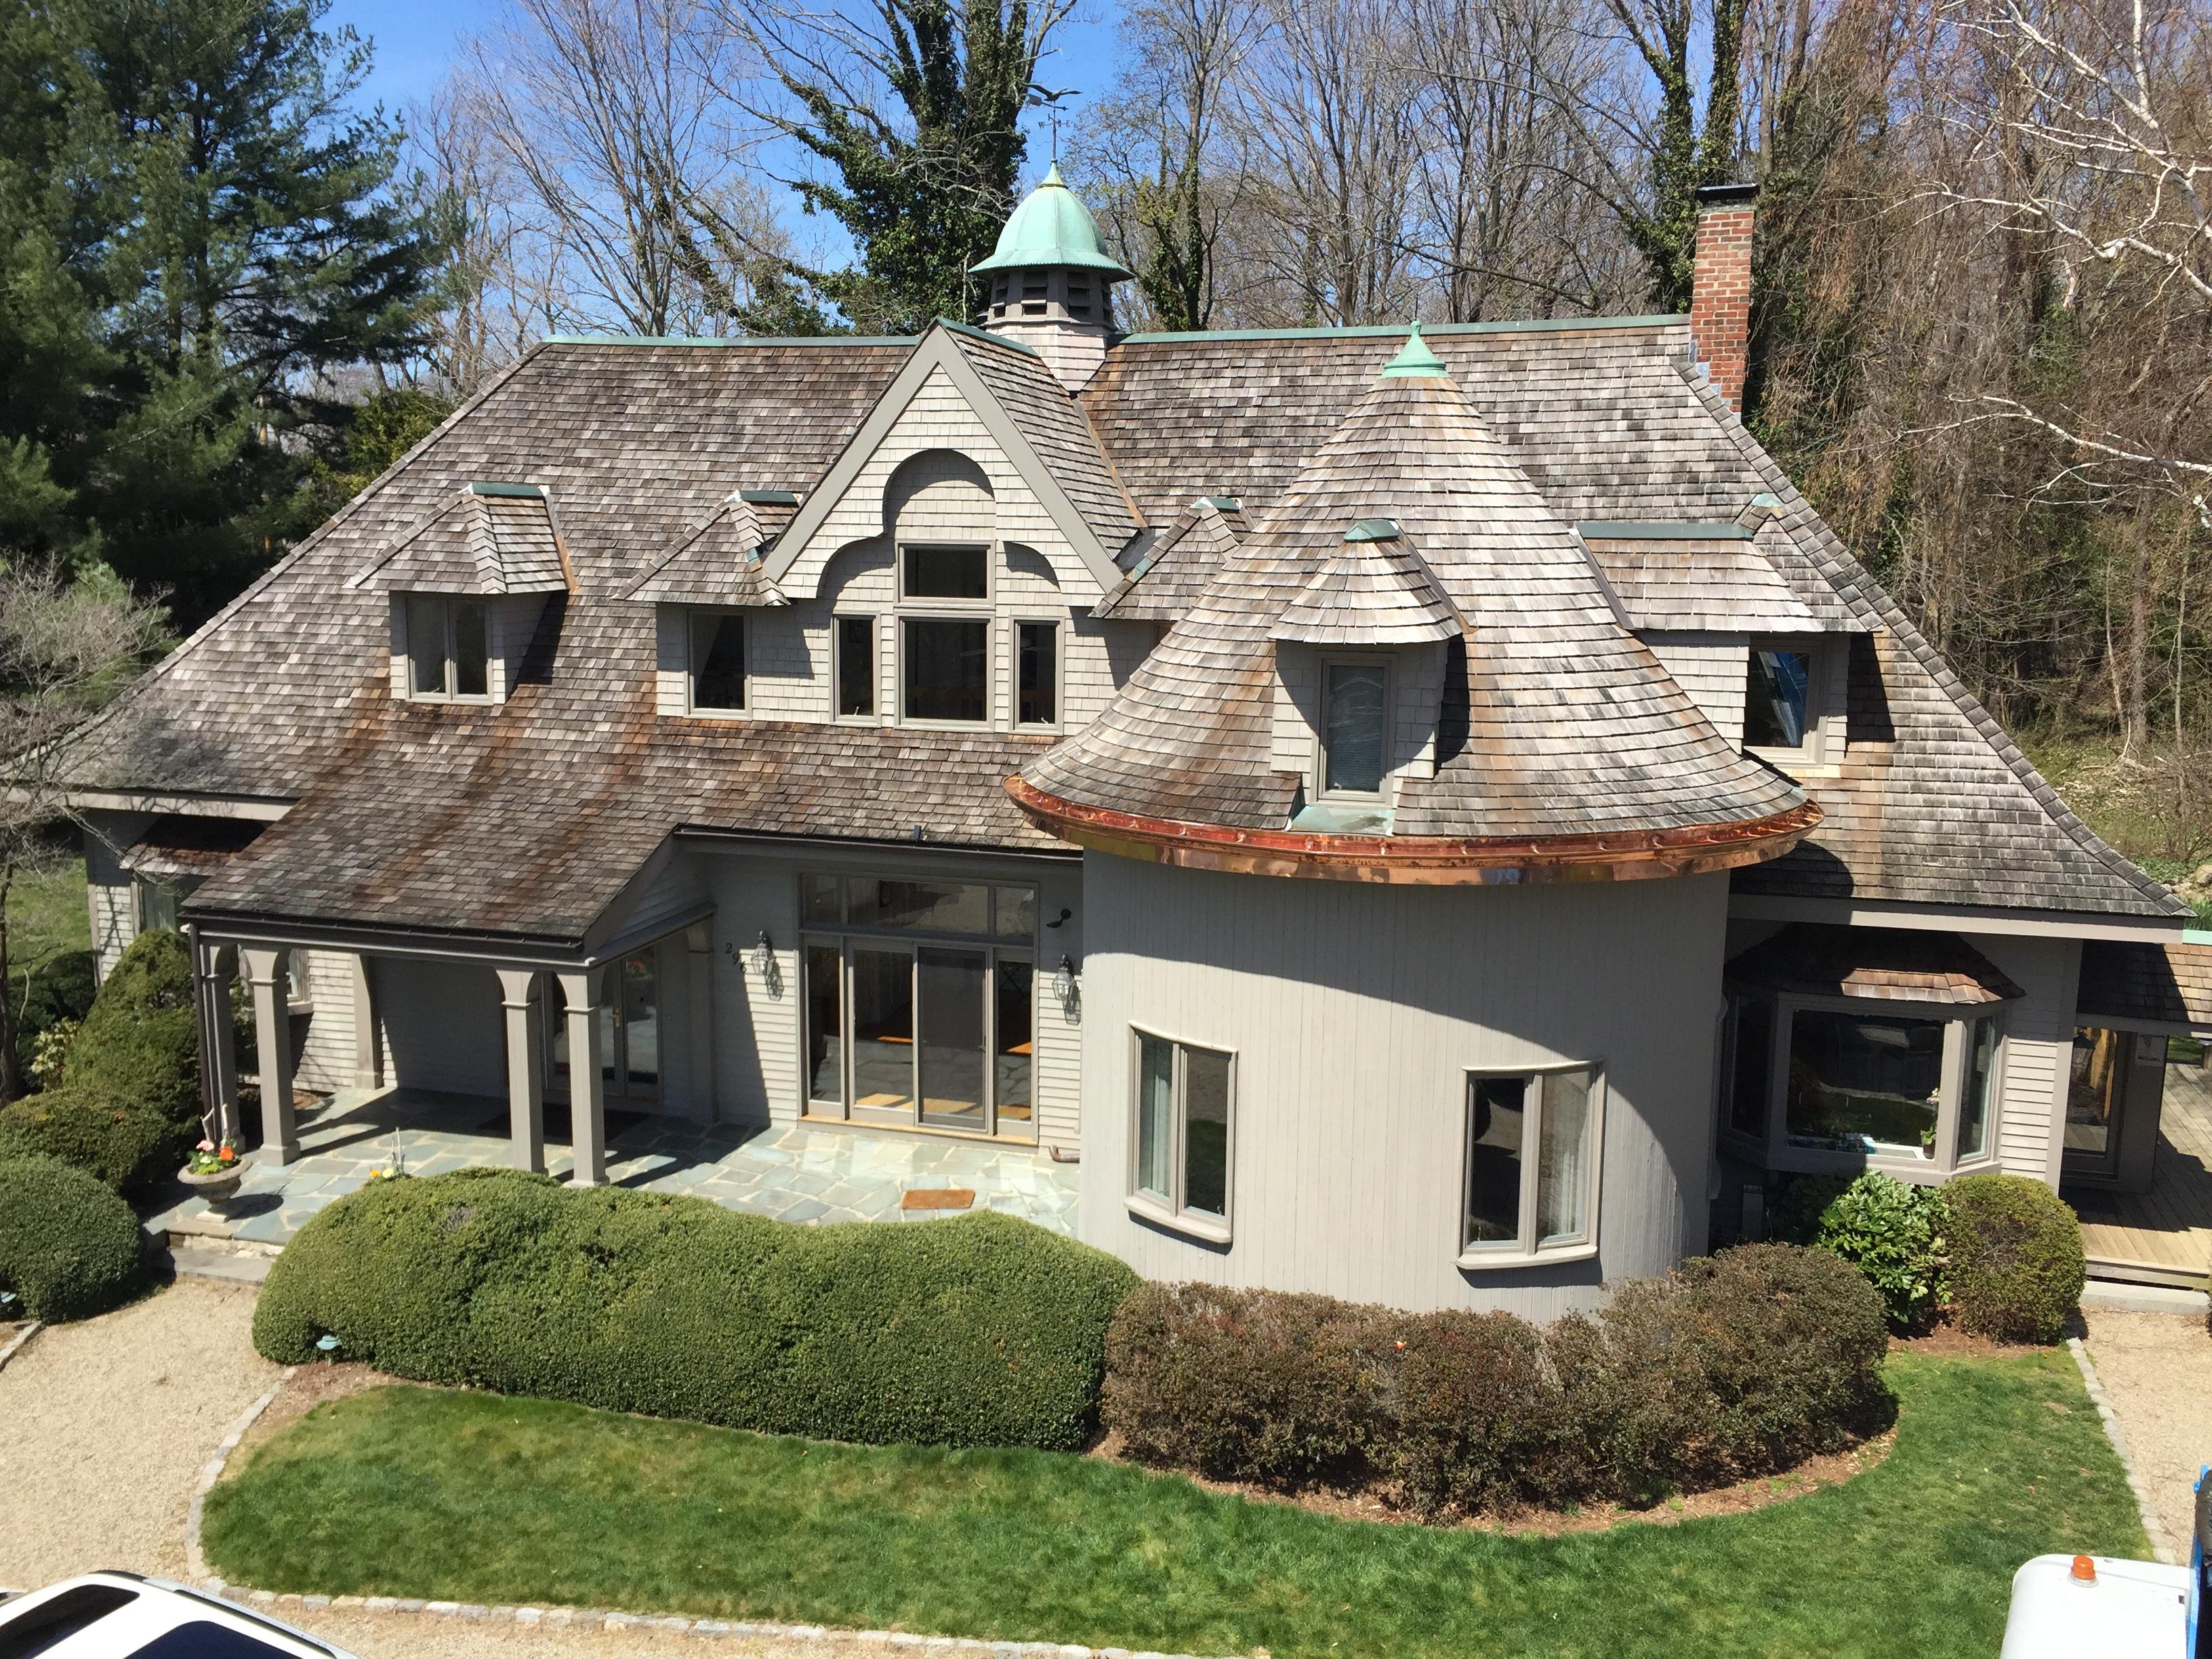 Cape Cod Roofing And Siding Wareham Massachusetts Ma